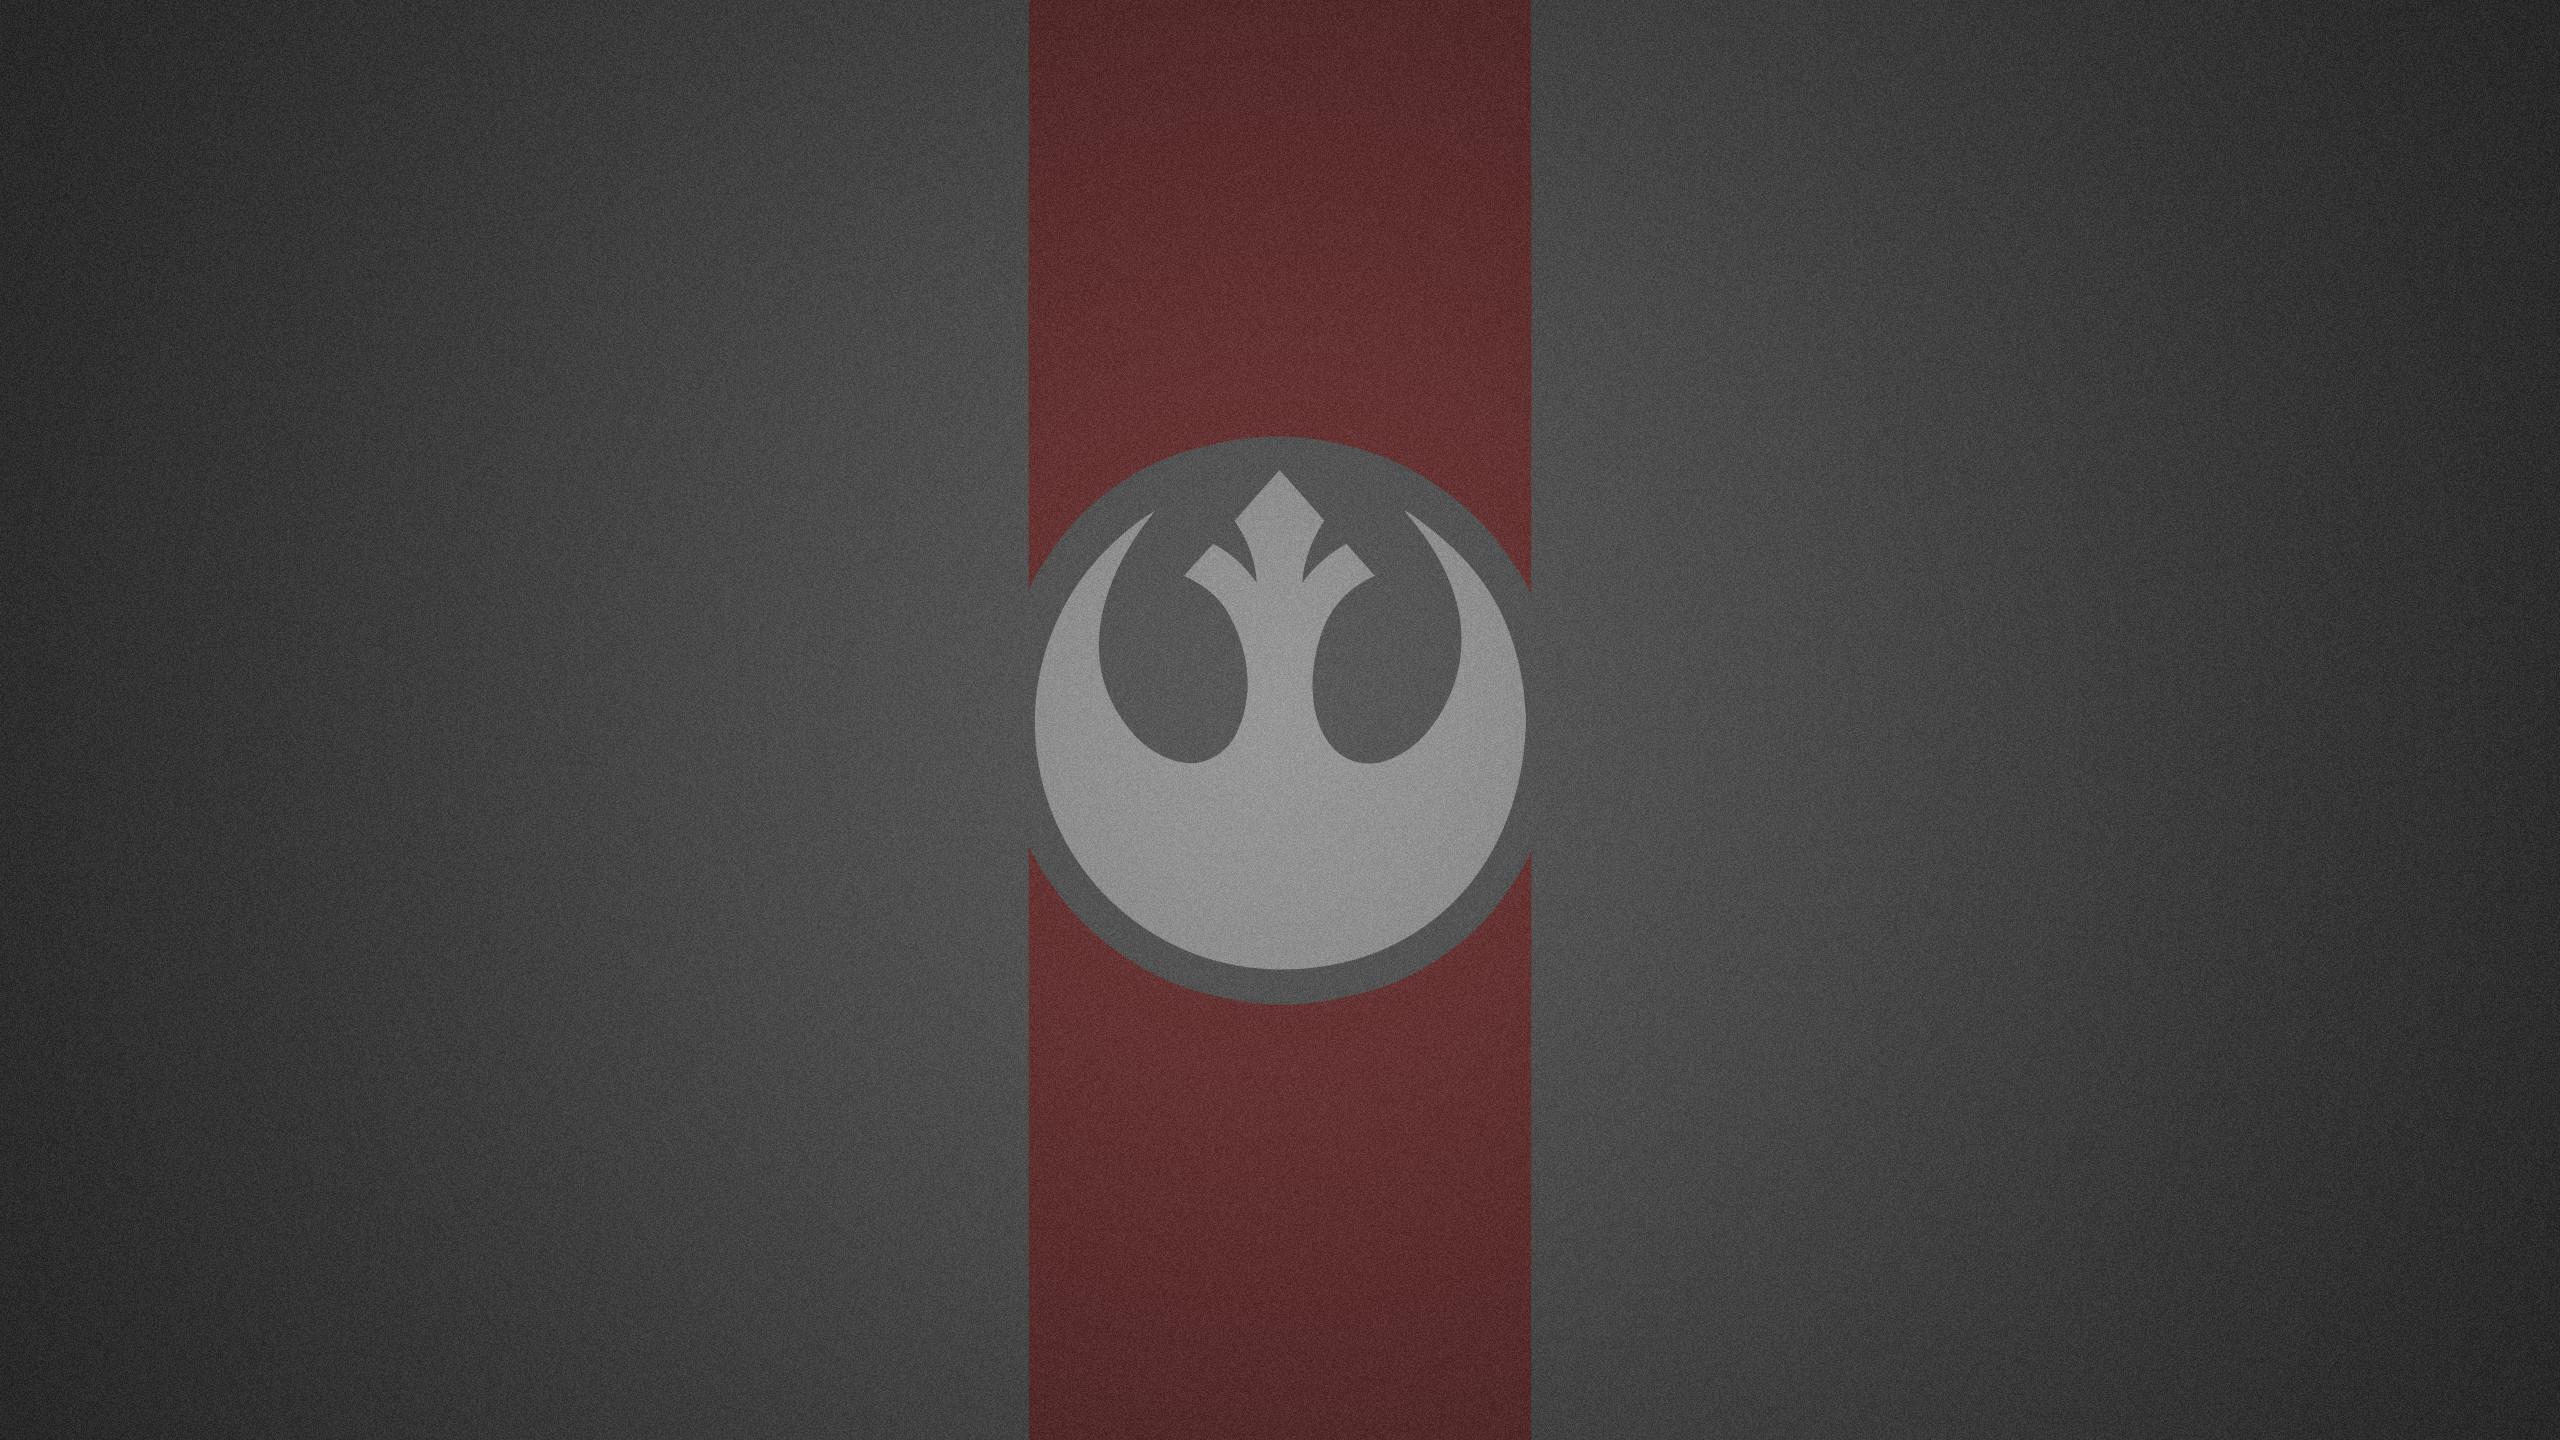 Star Wars Rebel Alliance Wallpaper